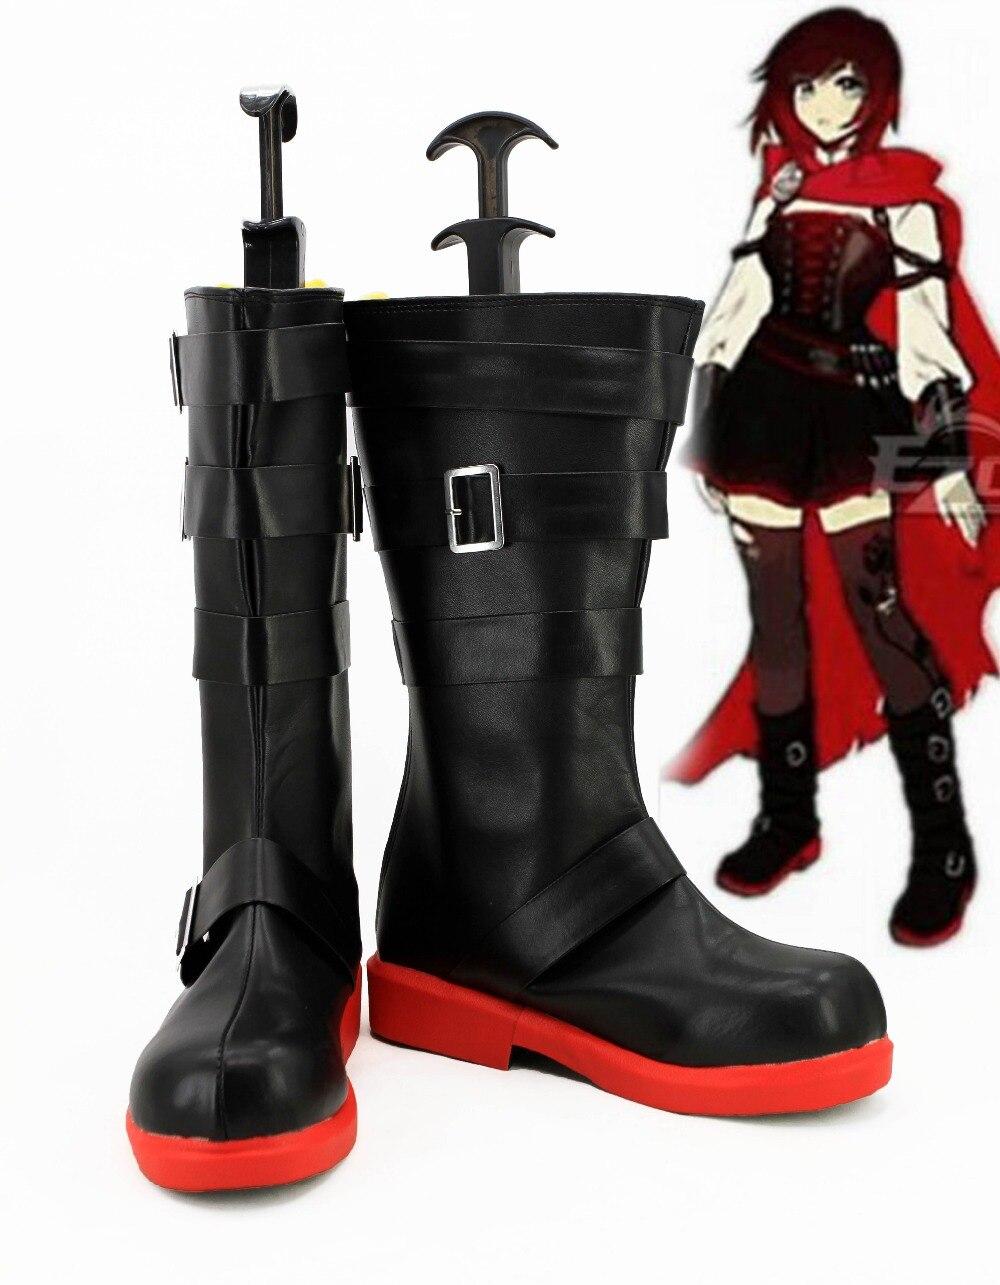 Remolque rojo Ruby Rose Cosplay botas Zapatos Anime fiesta Cosplay botas hechas a medida zapatos de mujer